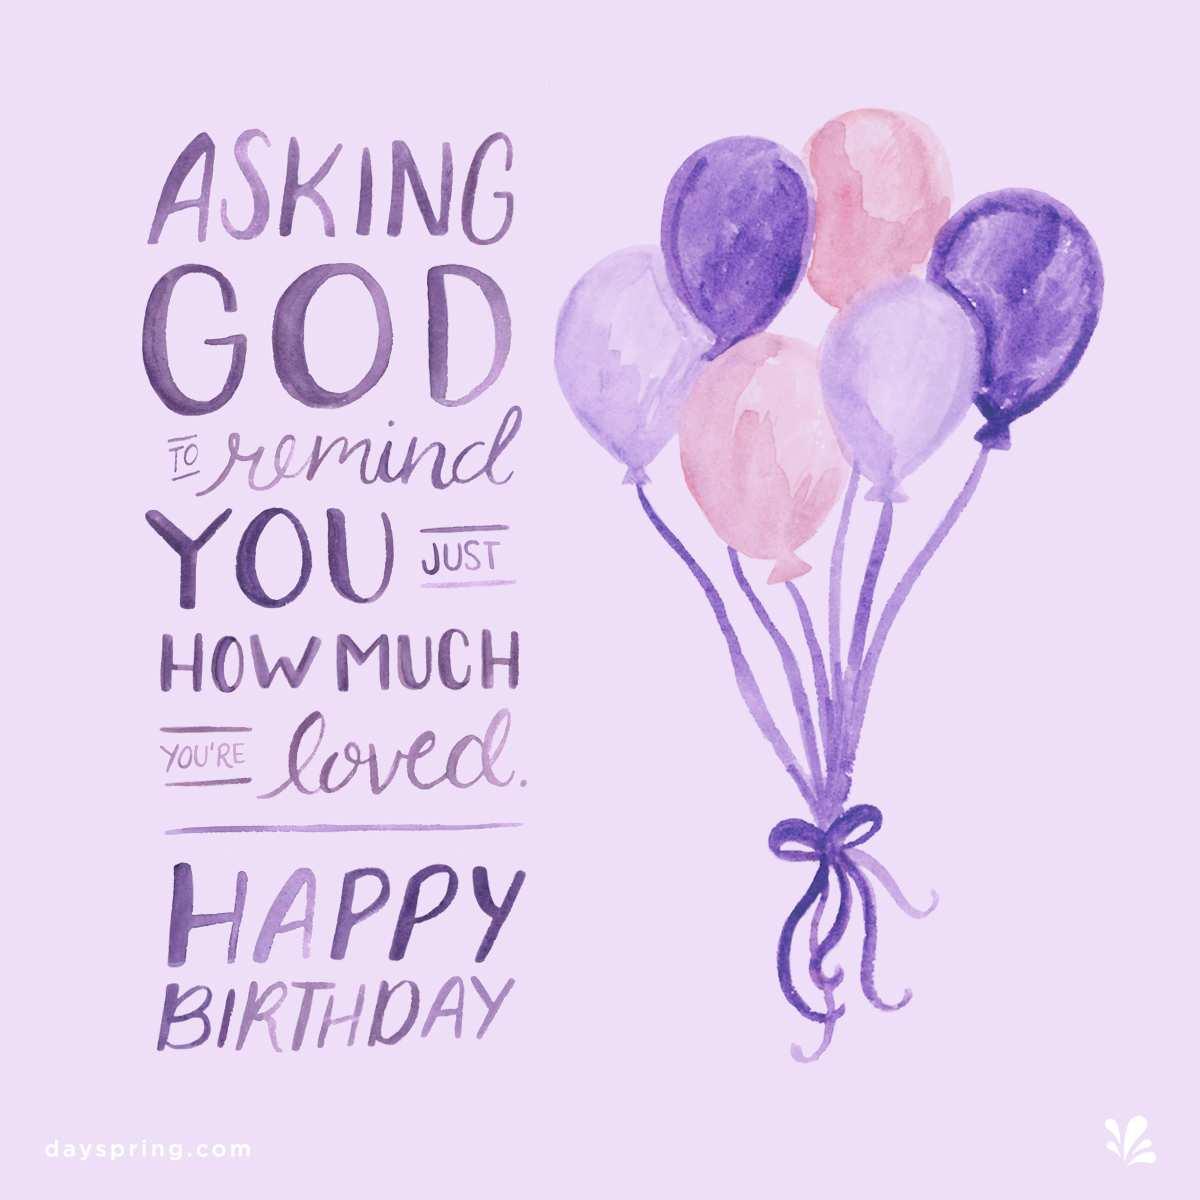 Free Religious Birthday Card Templates Cards Design Templates